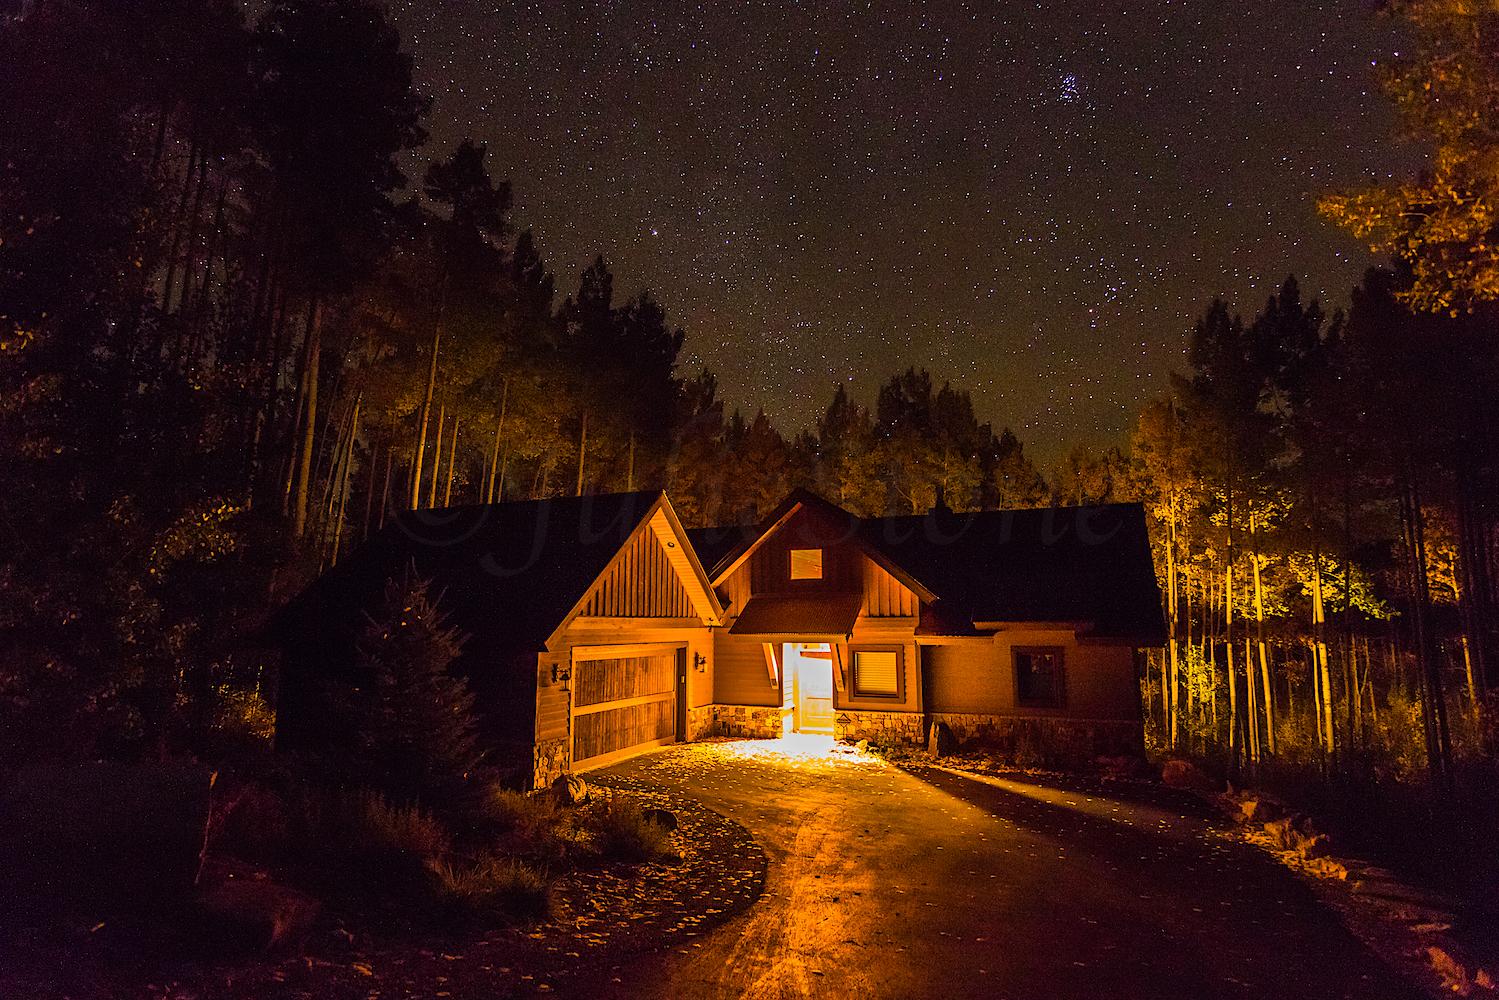 Durango House, Image # 1124